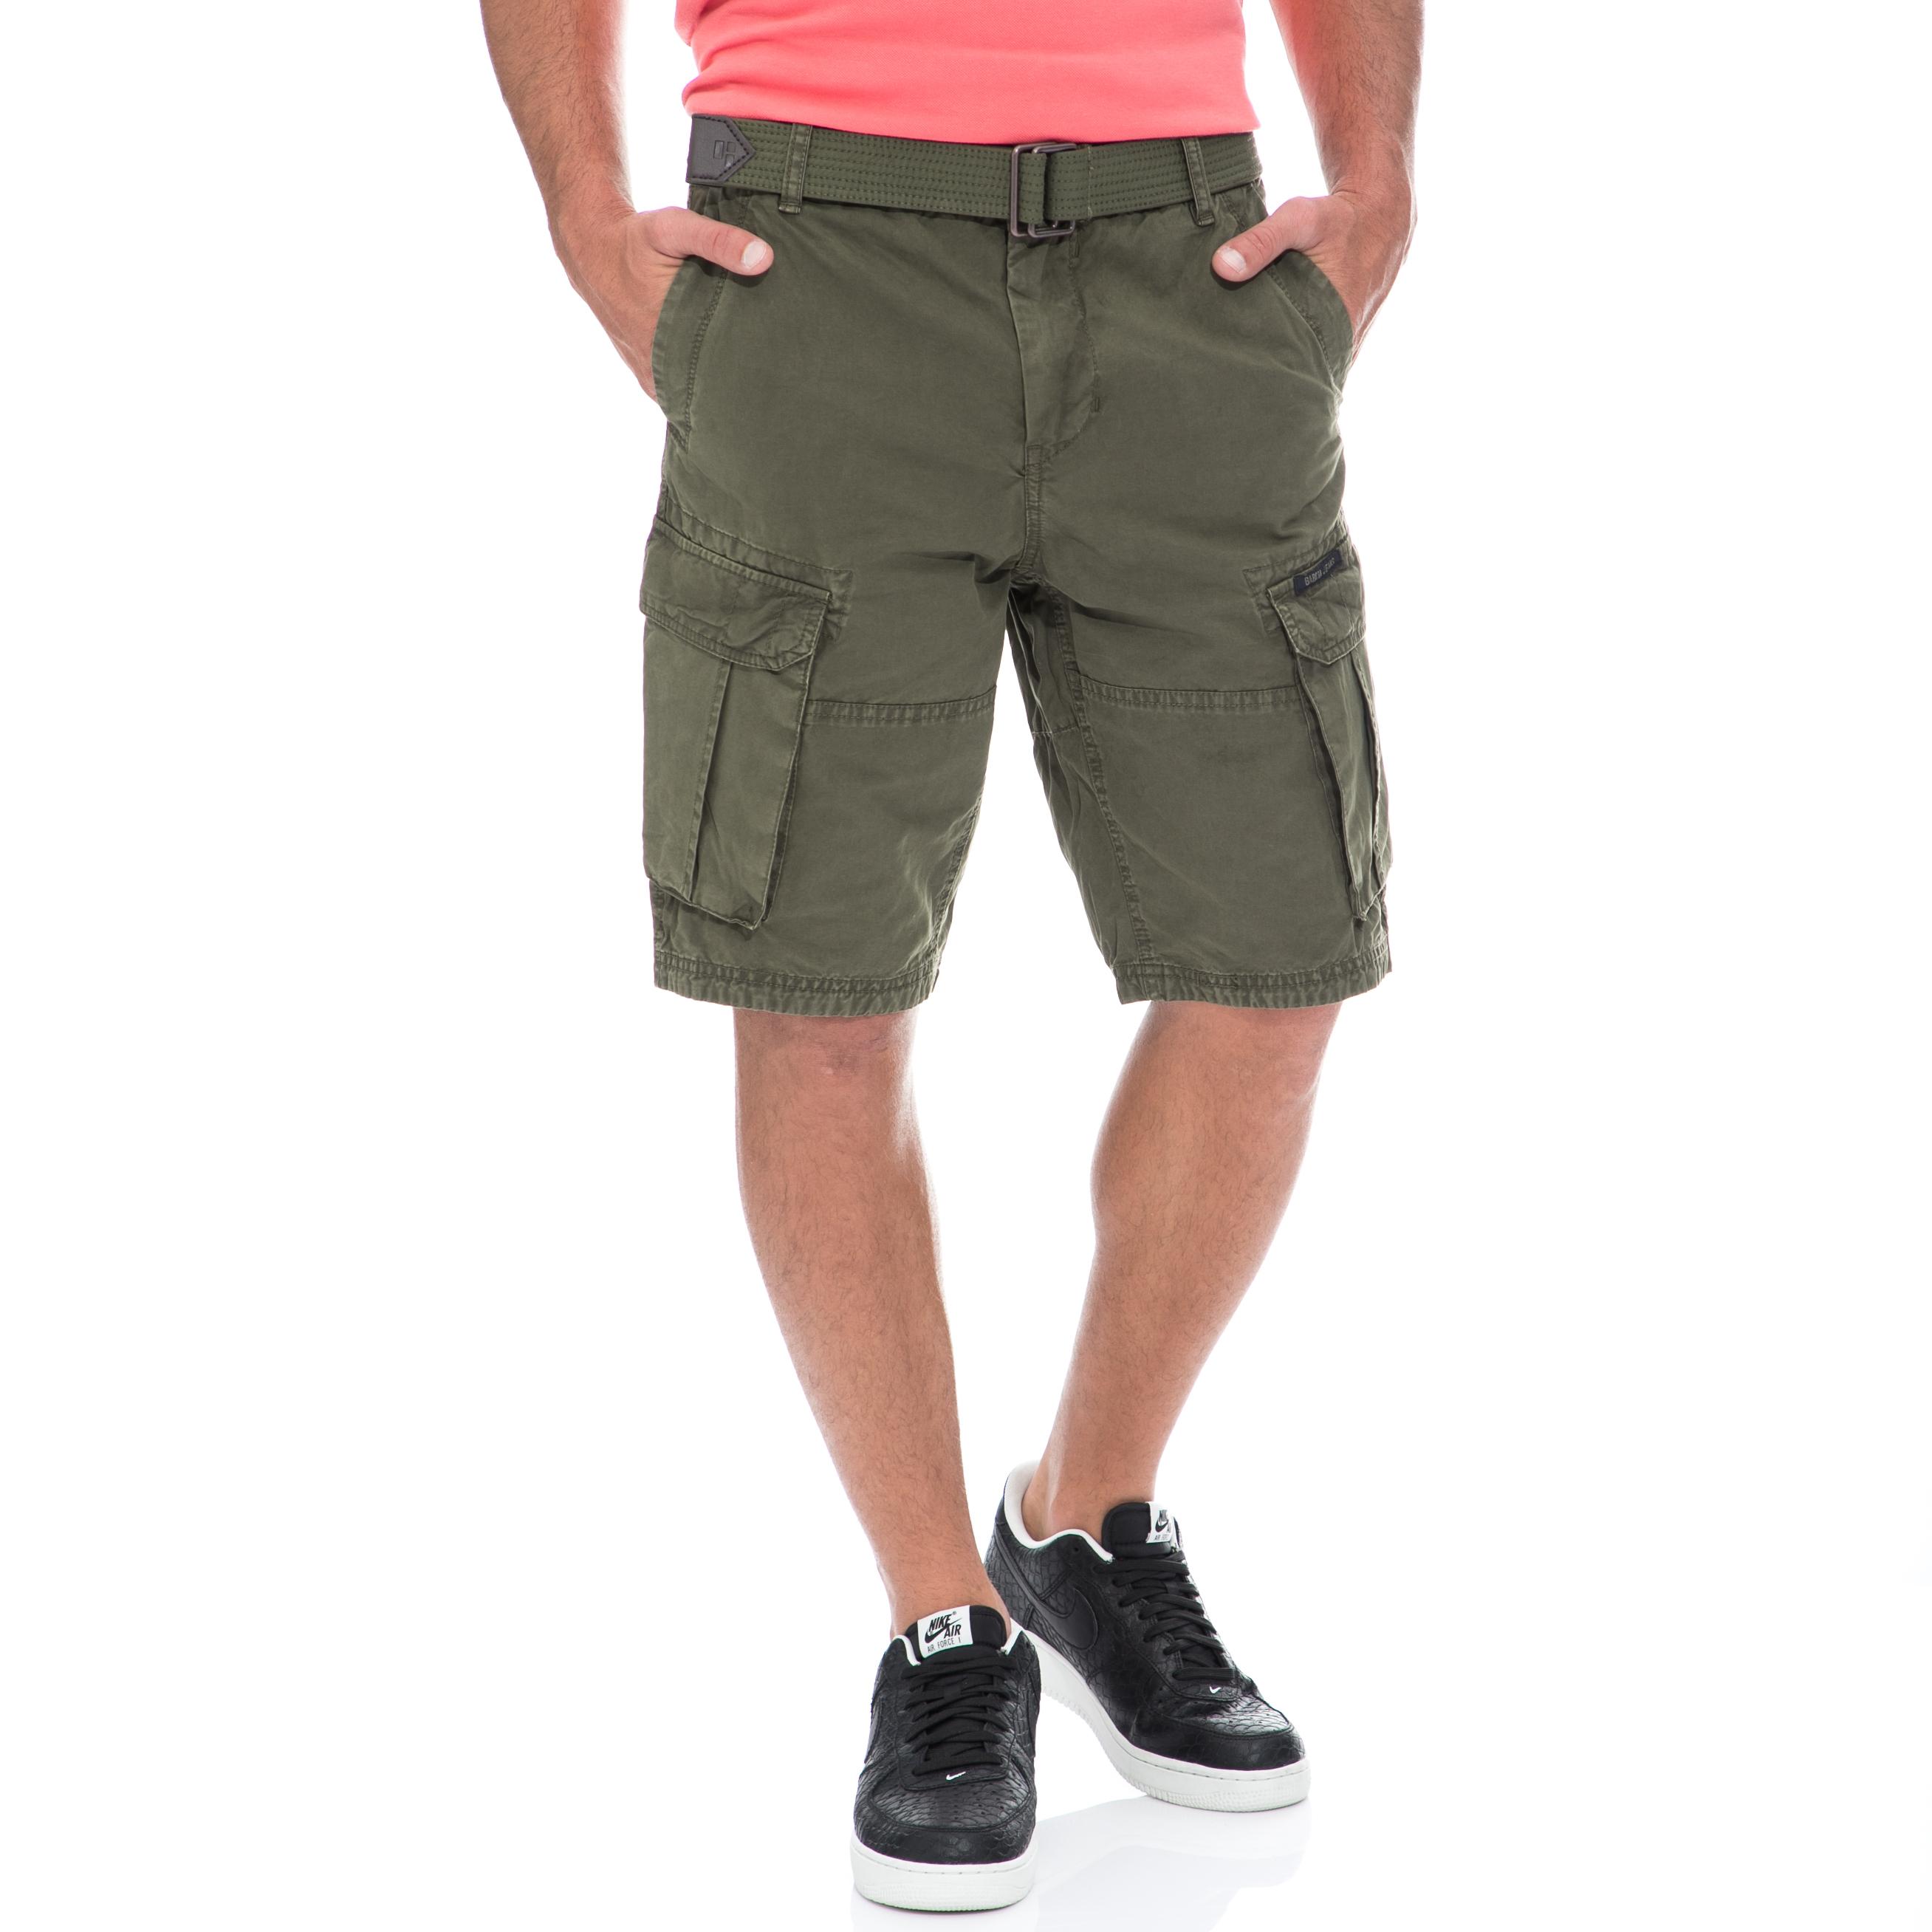 GARCIA JEANS - Αντρική βερμούδα GARCIA JEANS χακί ανδρικά ρούχα σορτς βερμούδες casual jean